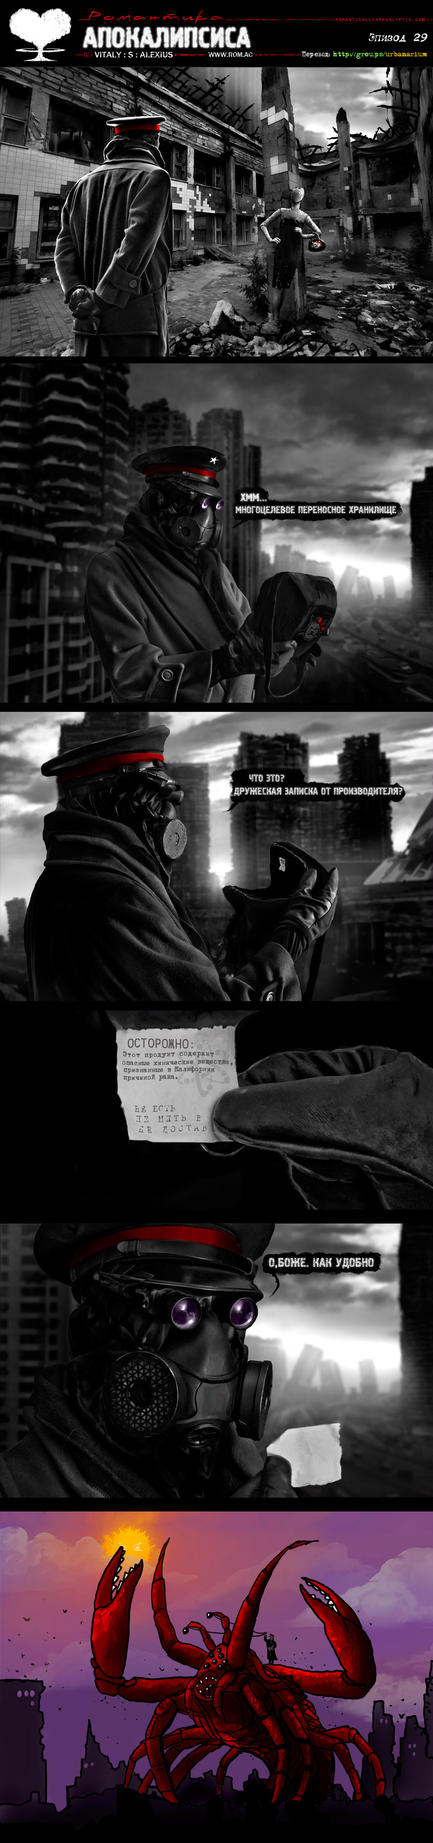 Romantically Apocalyptic 29 by Urbanarium